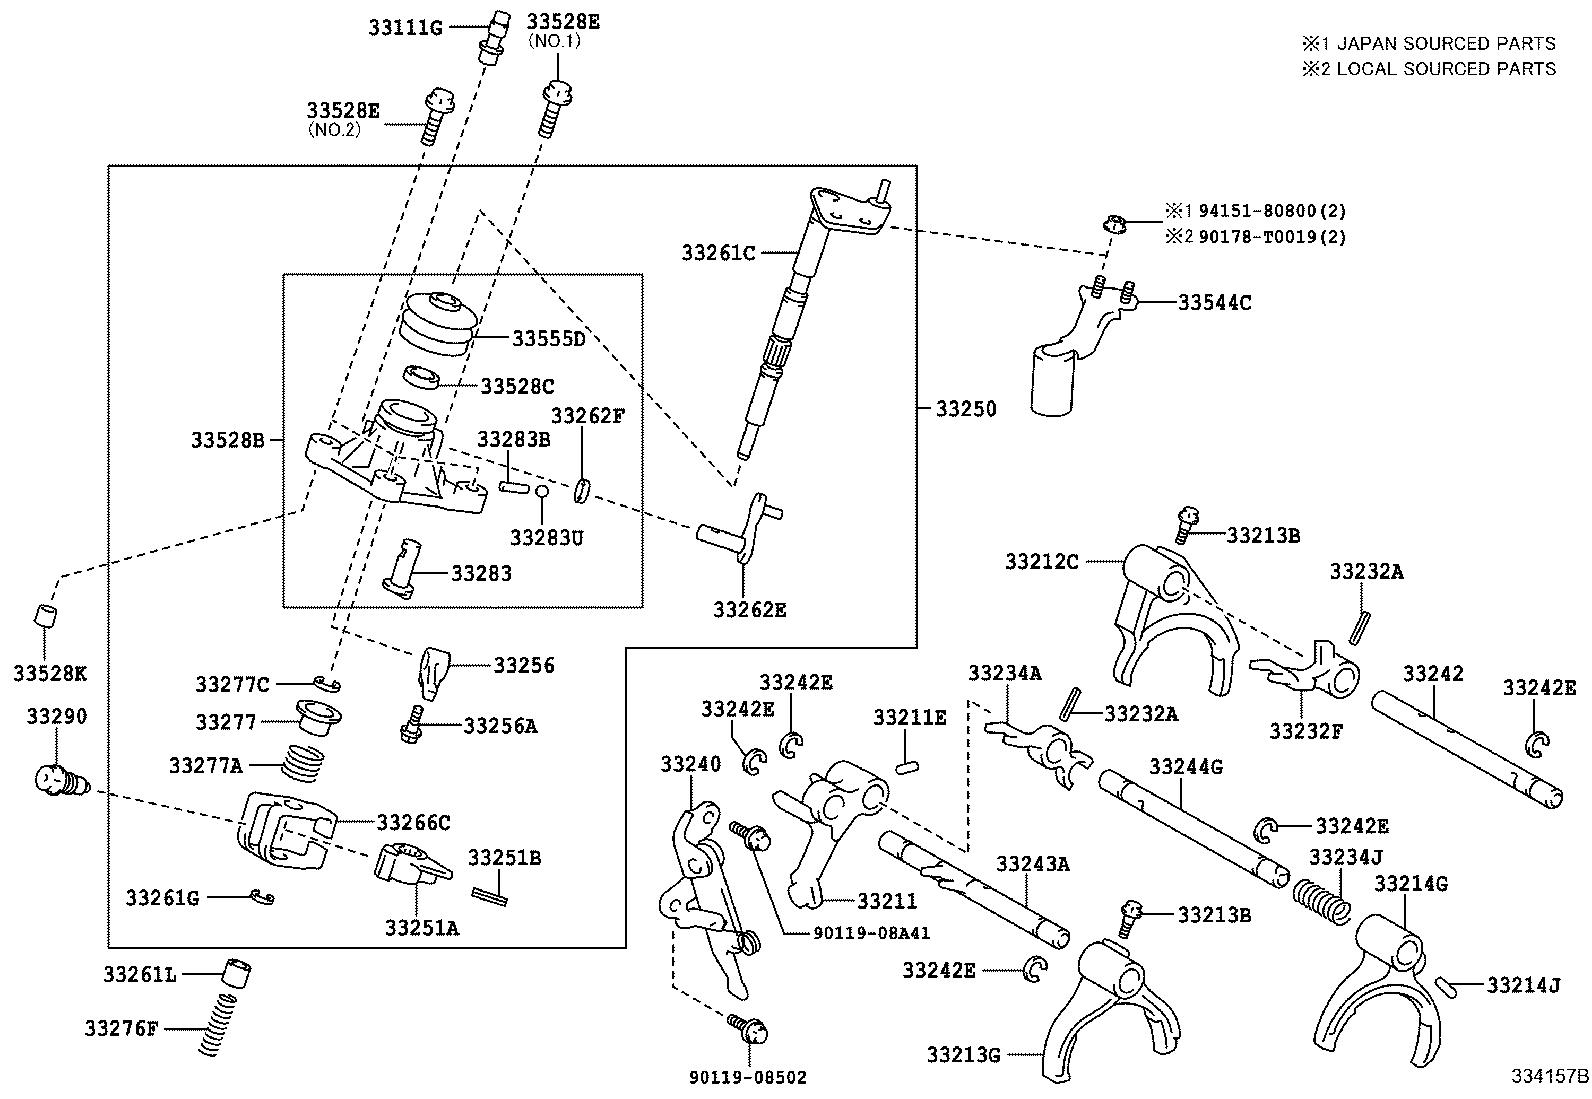 toyota etios livangk15r-aemgkx - powertrain-chassis